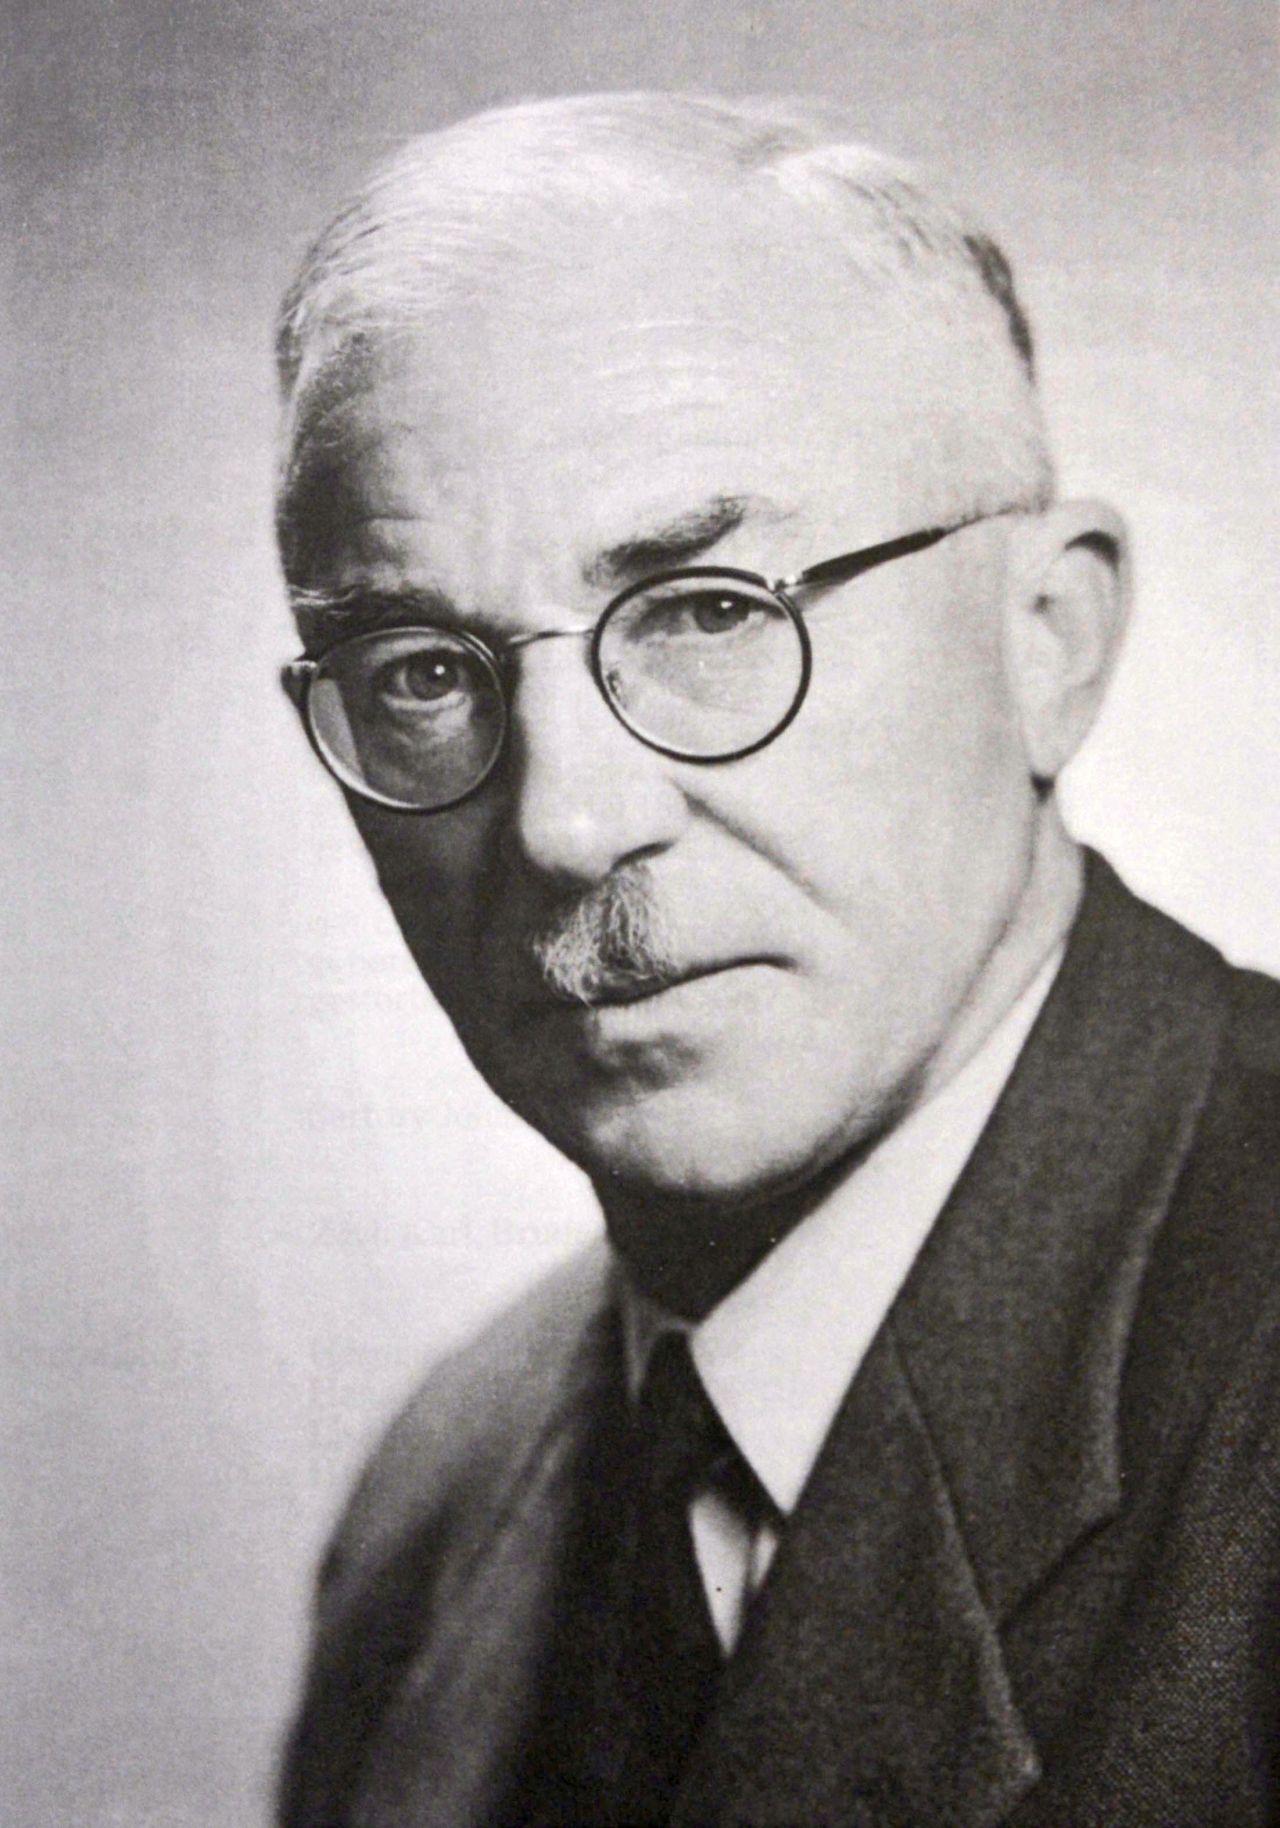 Karl Zäch 1892-1974